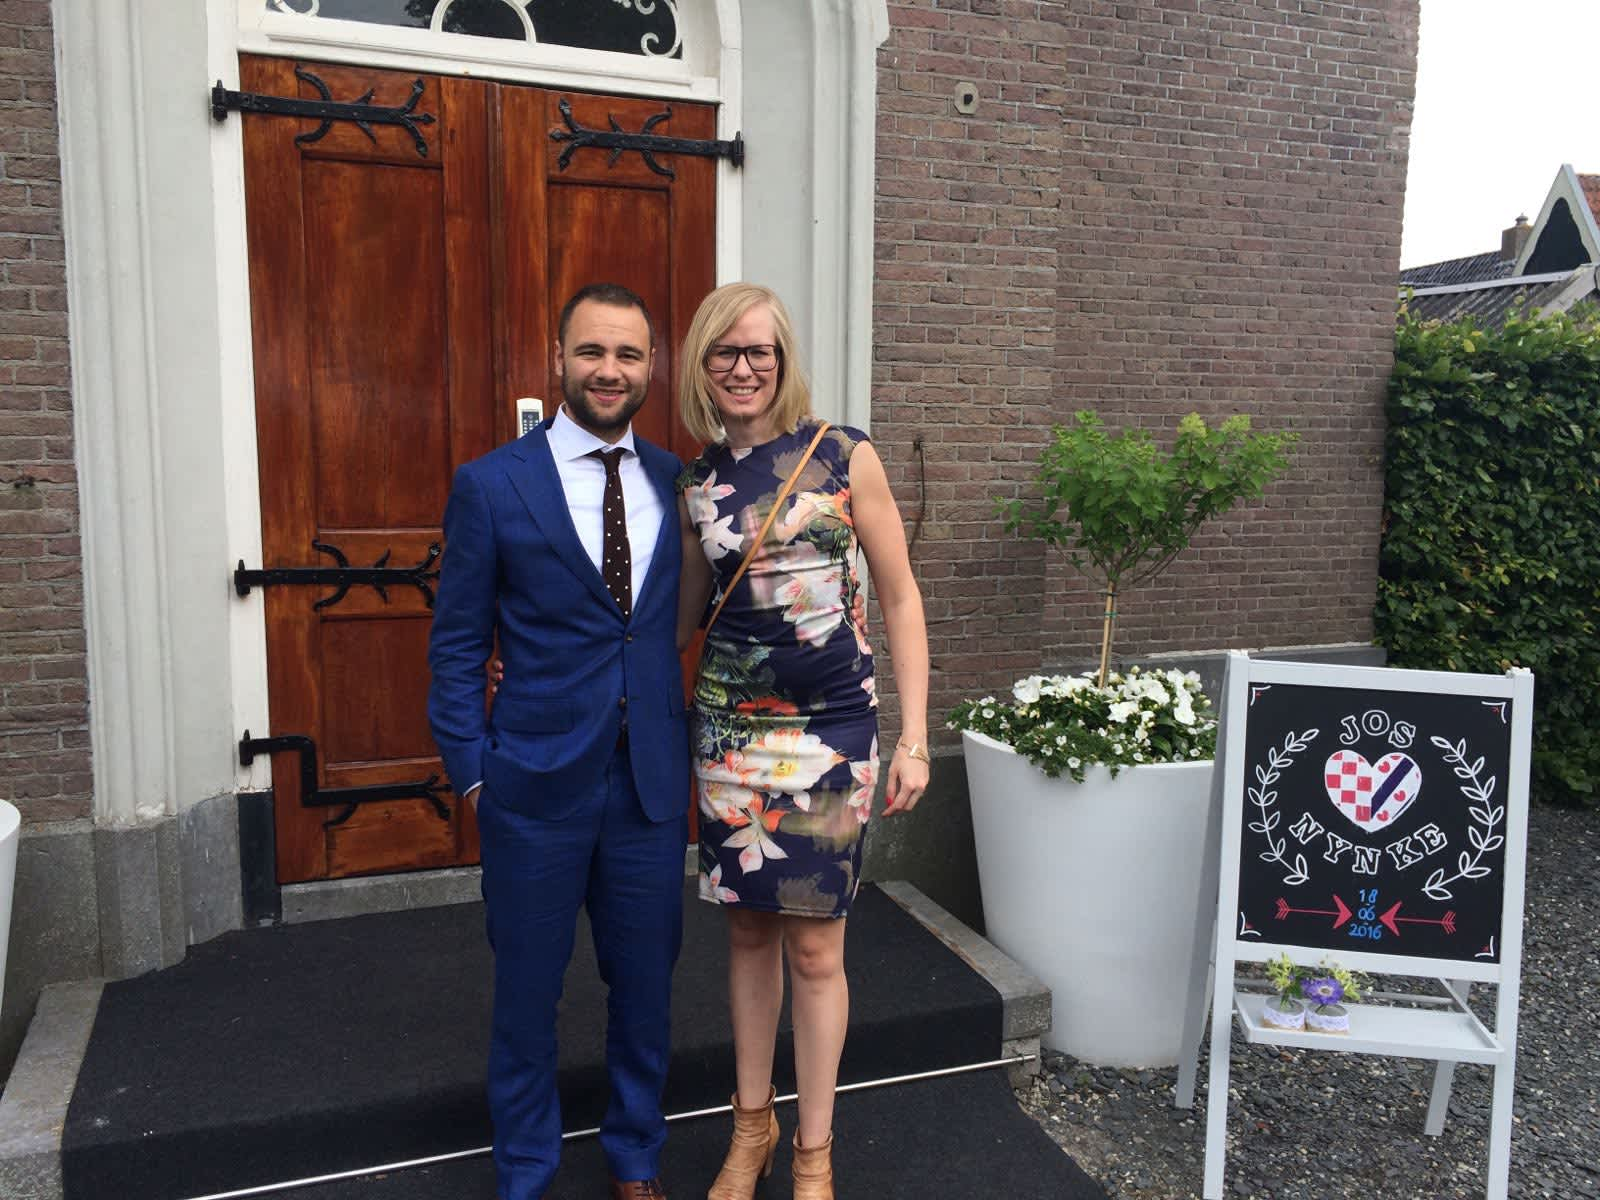 Annegreeth & Pim from Groningen, Netherlands